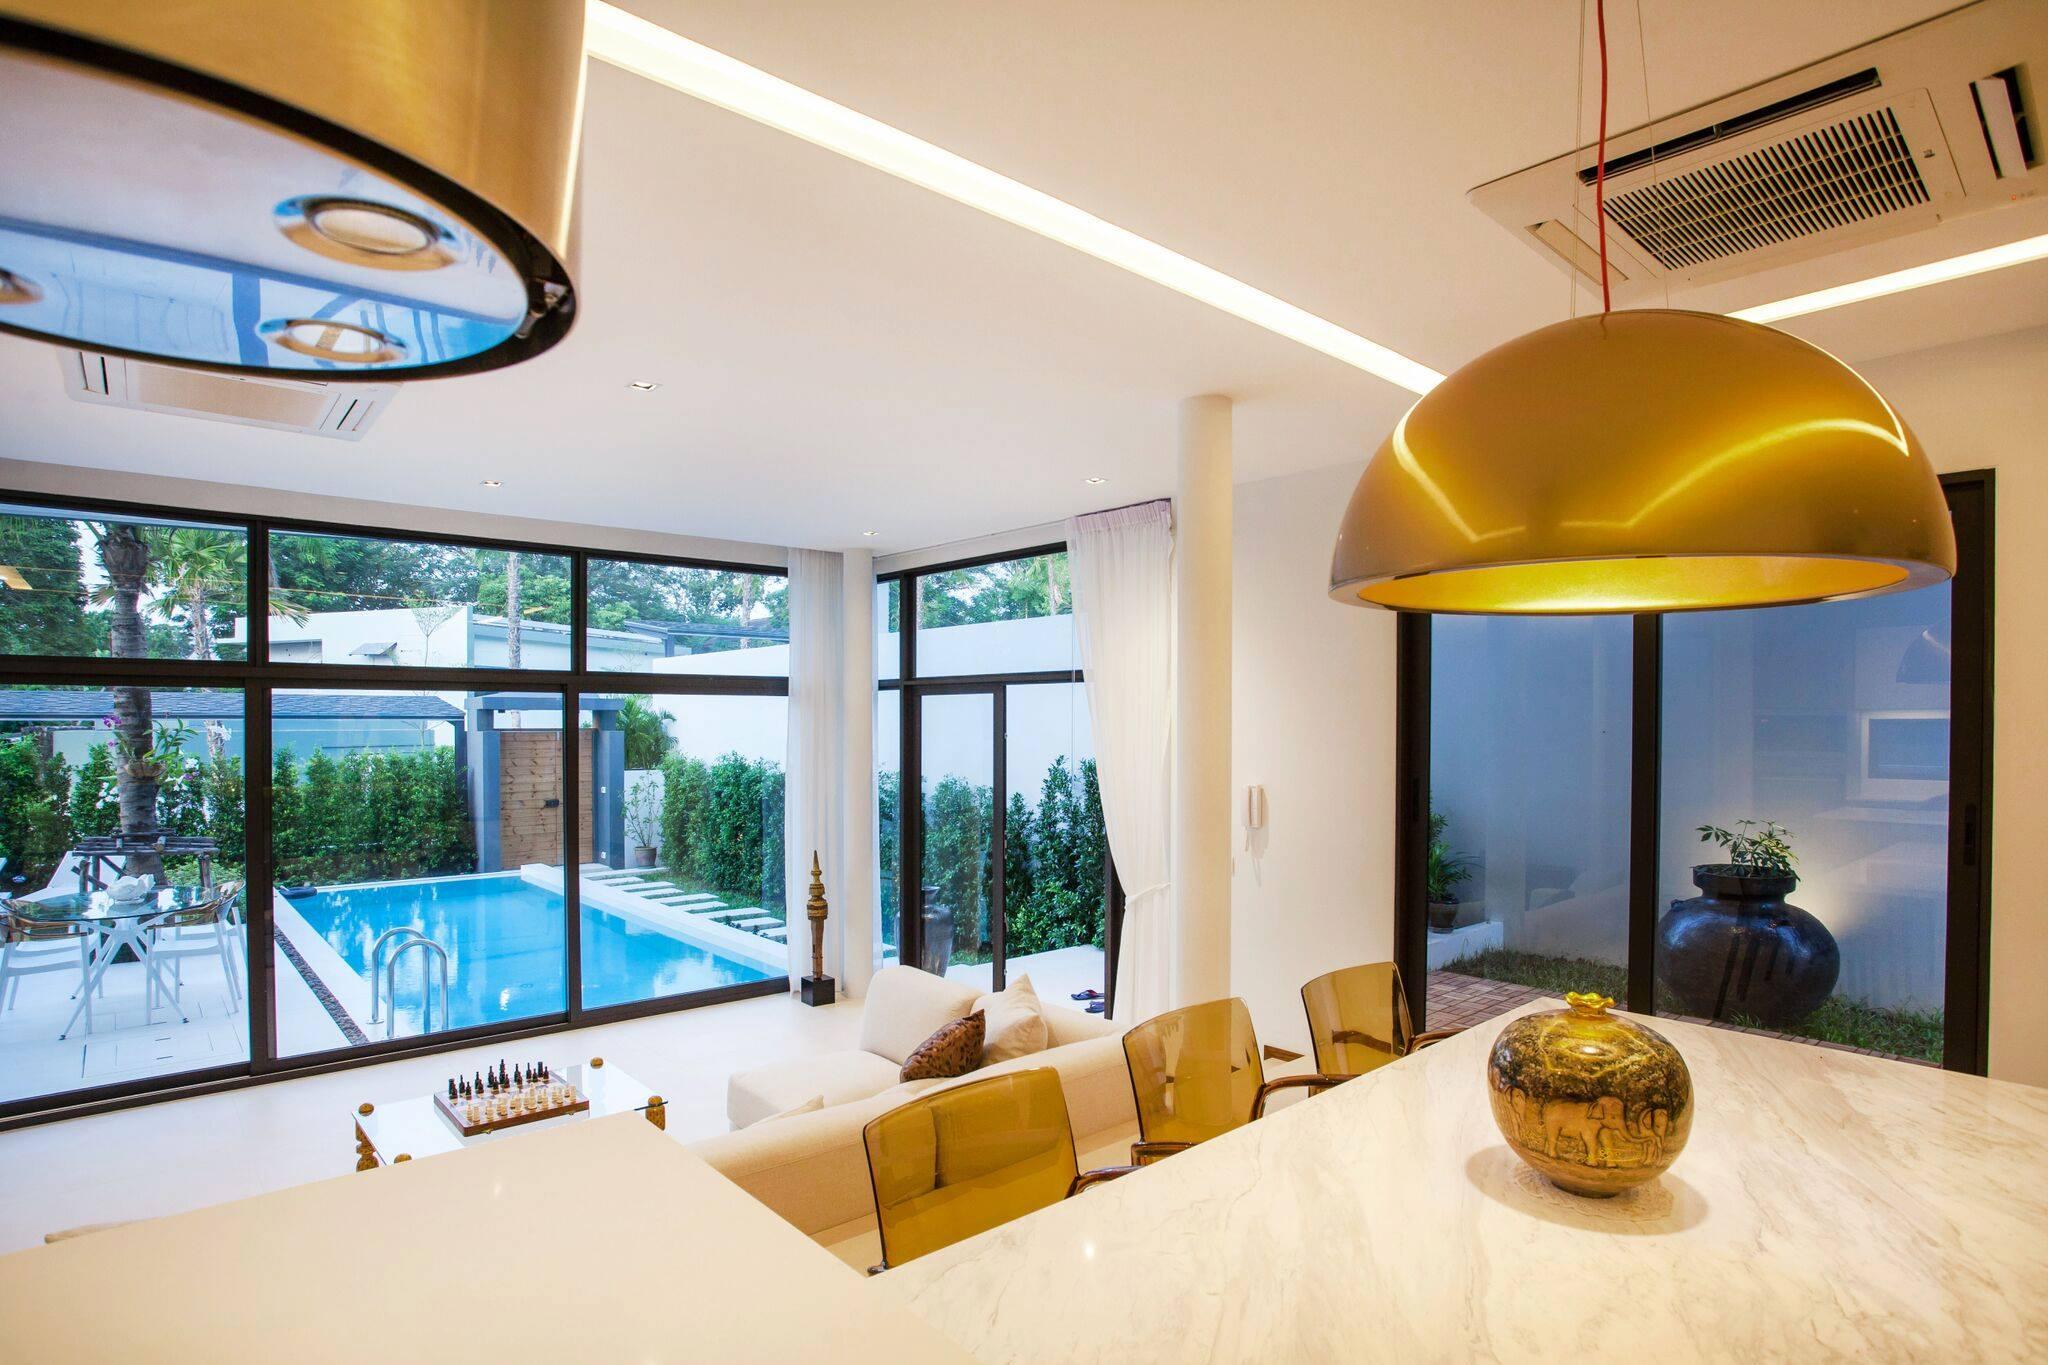 Phuket Real Estate Agency – Nai Harn Beach (40)